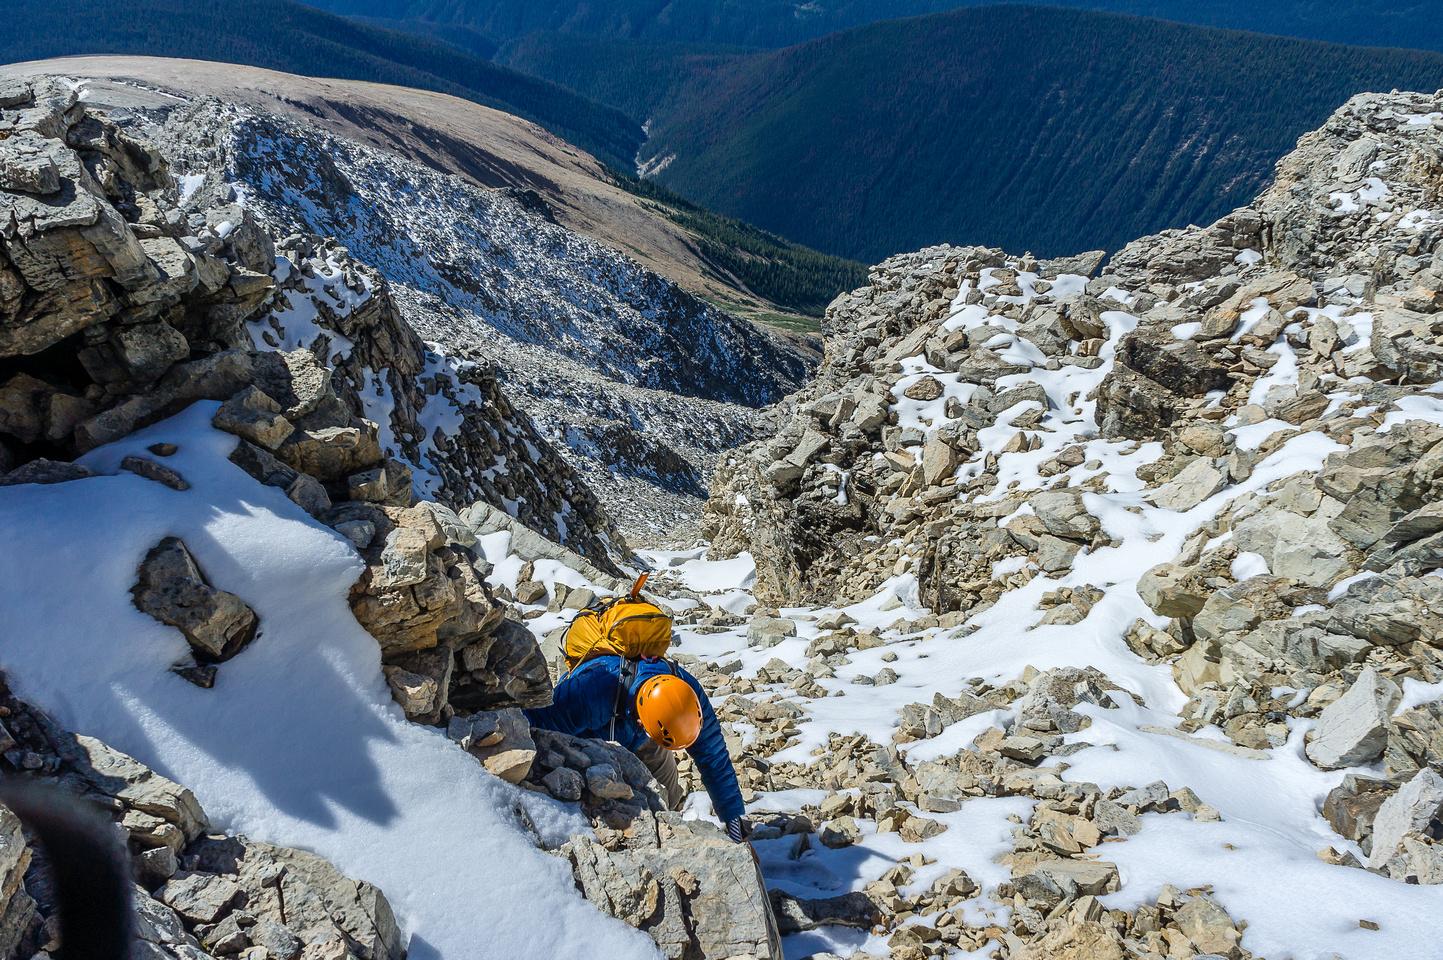 Steep scrambling on loose terrain.